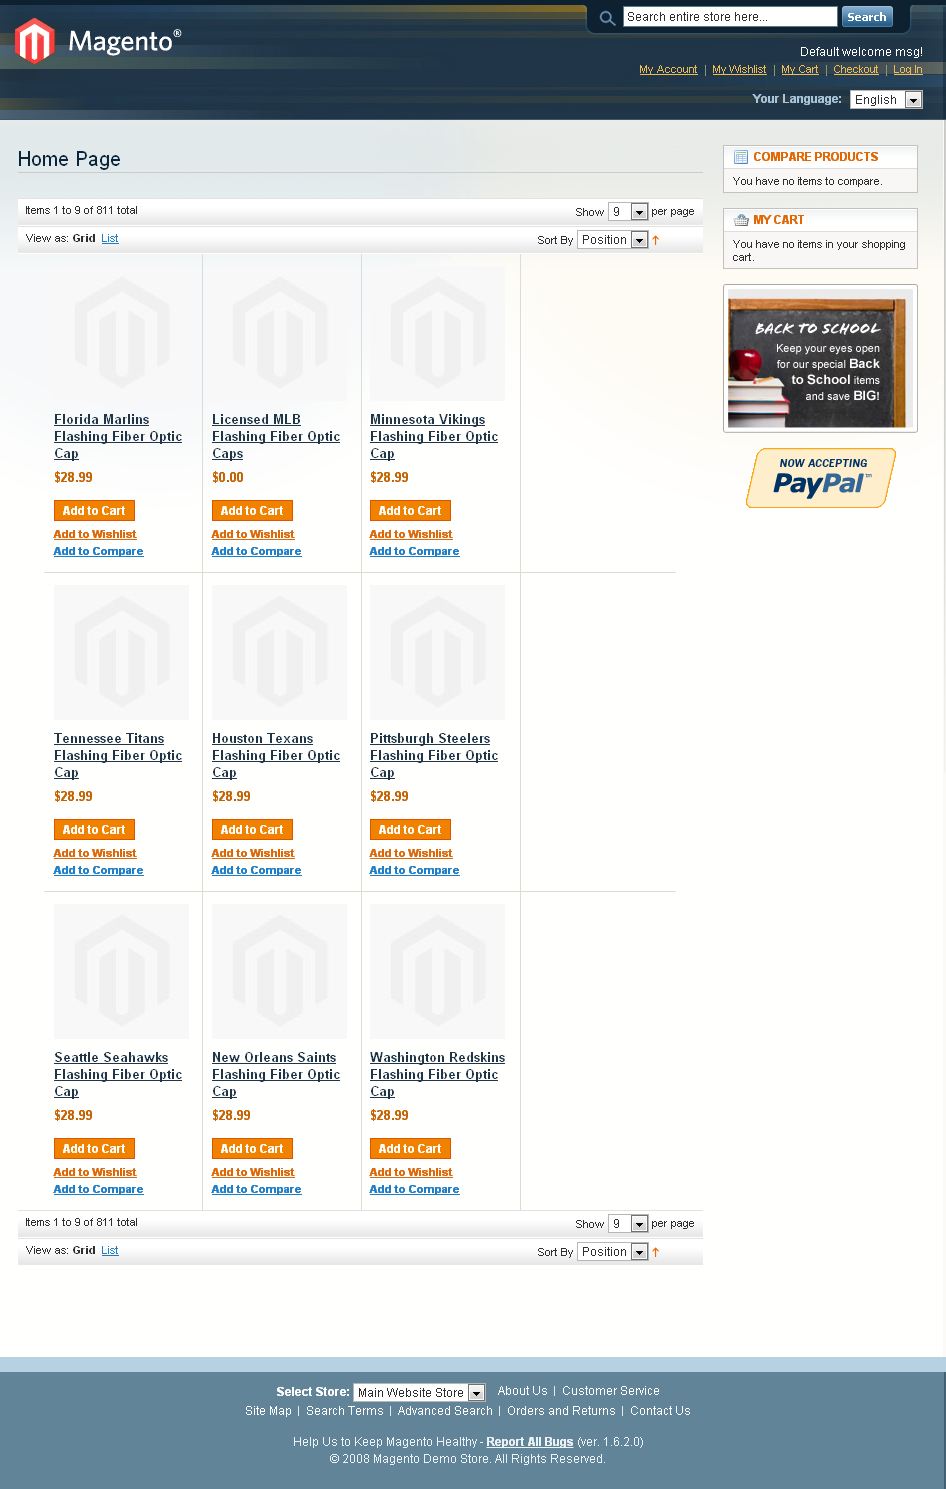 Magento Website for Web Hosting Service Provider 'Blinkee'